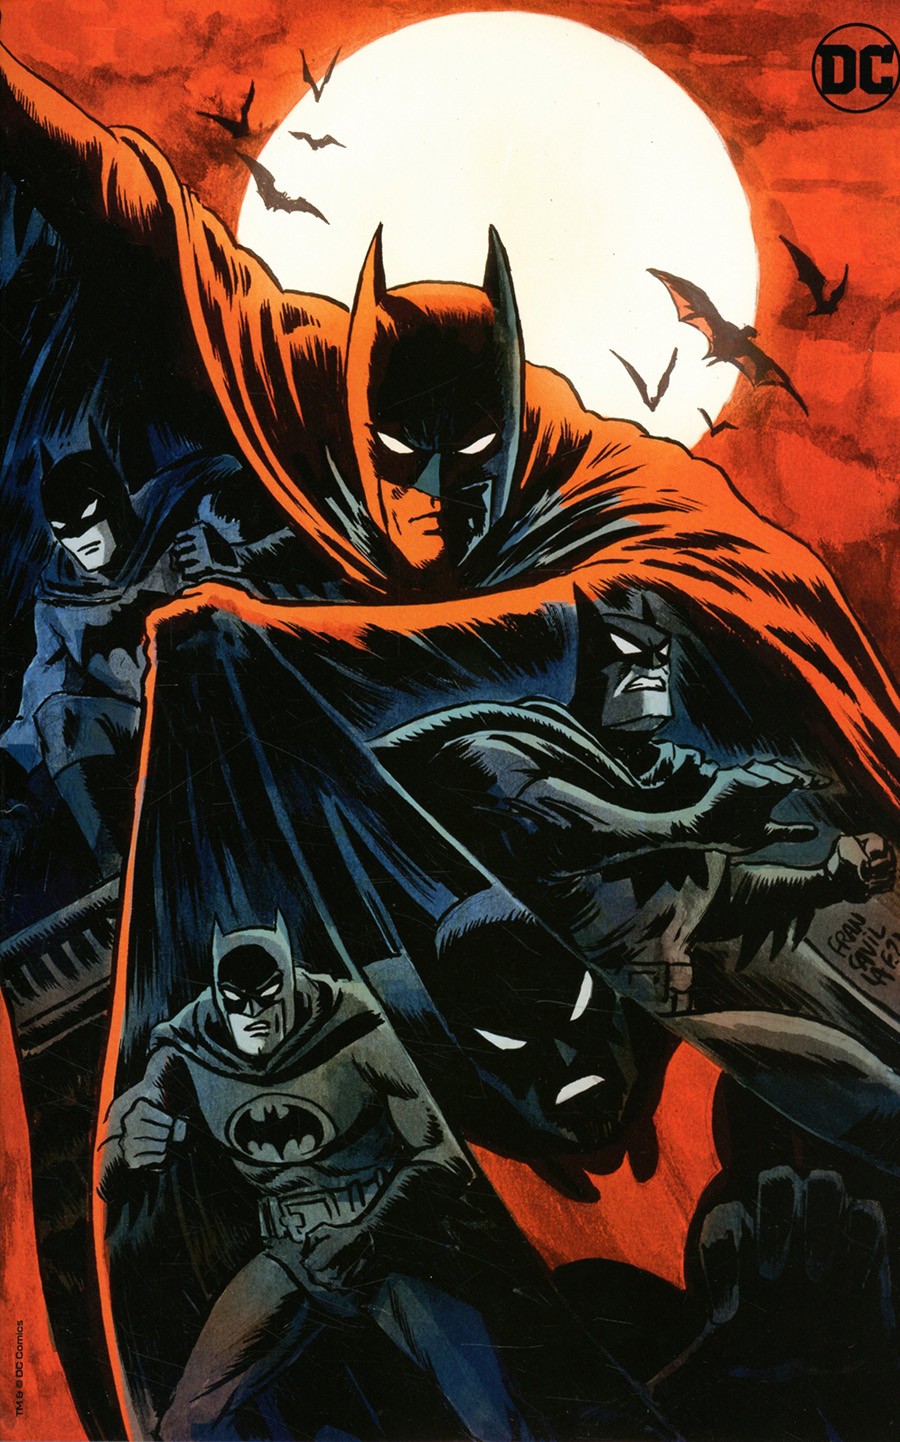 Legends Of The Dark Knight Vol 2 #1 Cover C Variant Francesco Francavilla Team Card Stock Cover